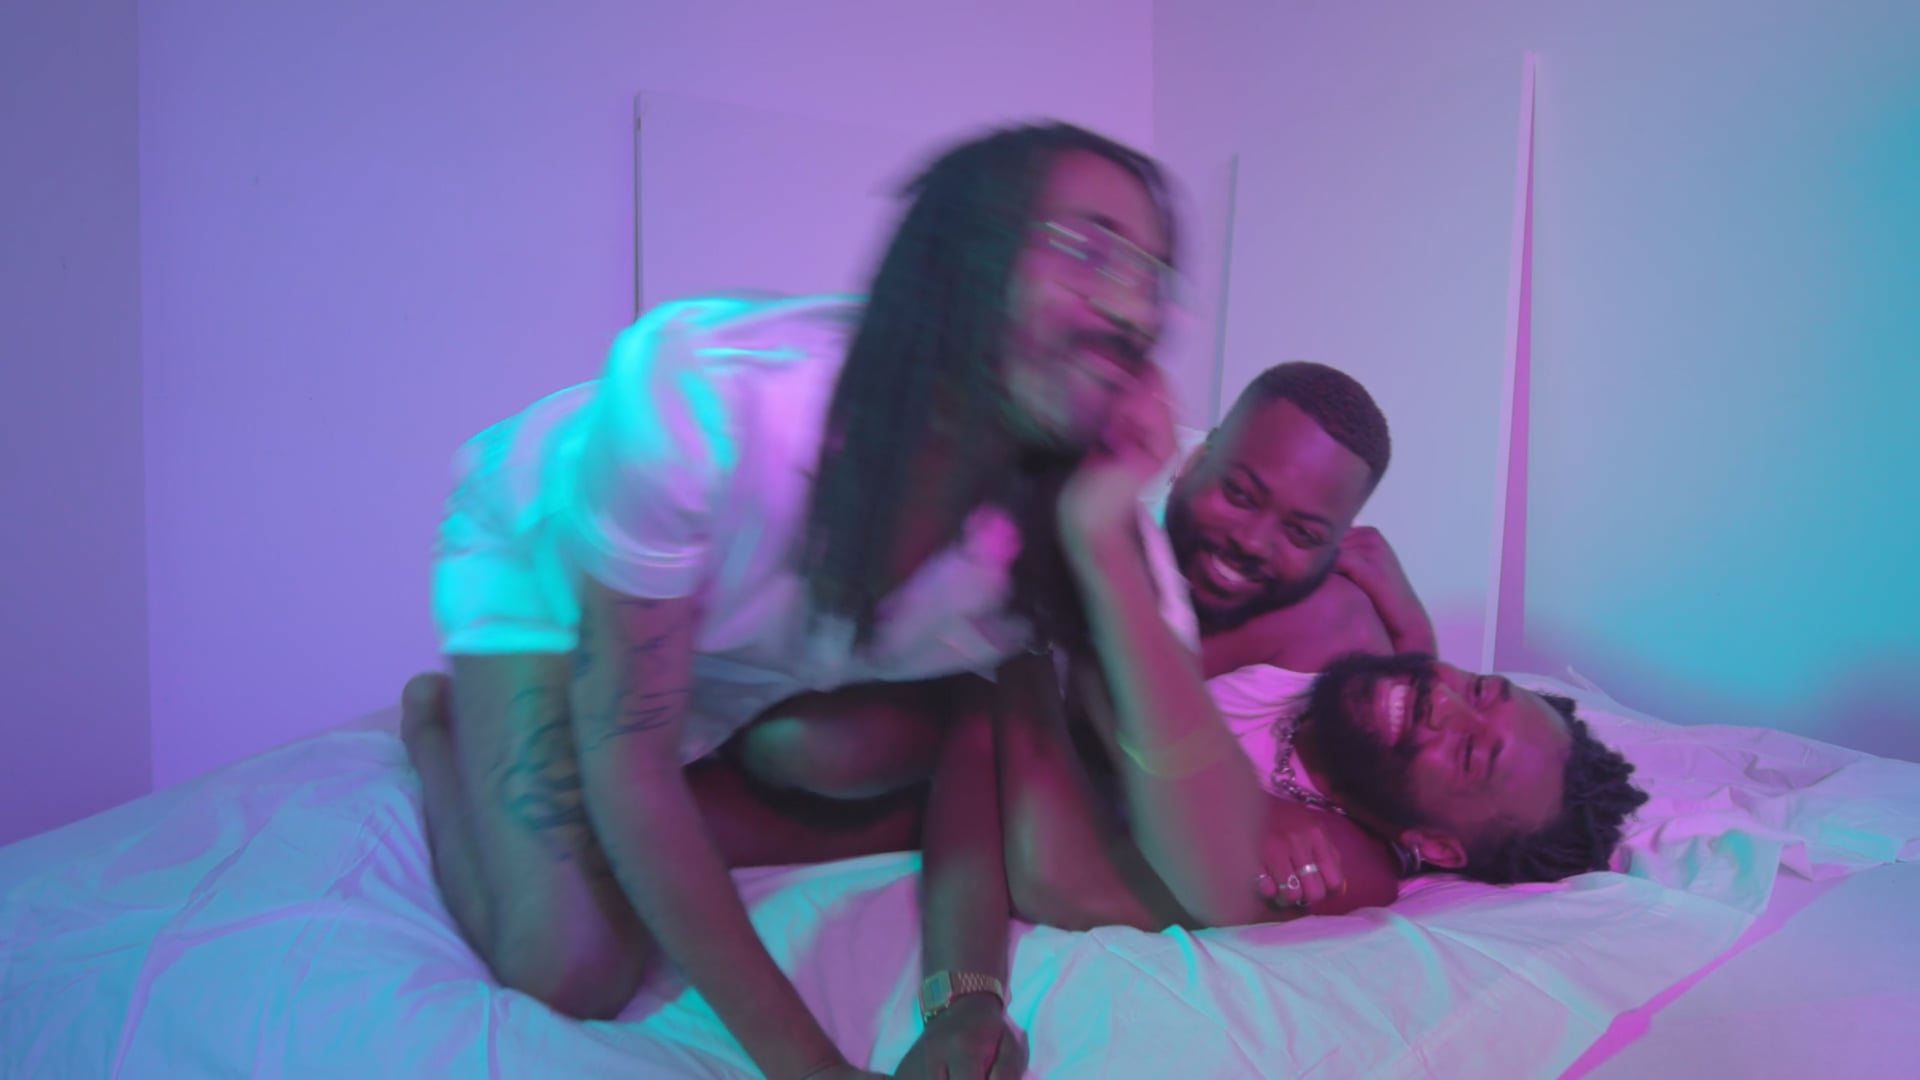 Blaq In Bed - Teaser (2021)